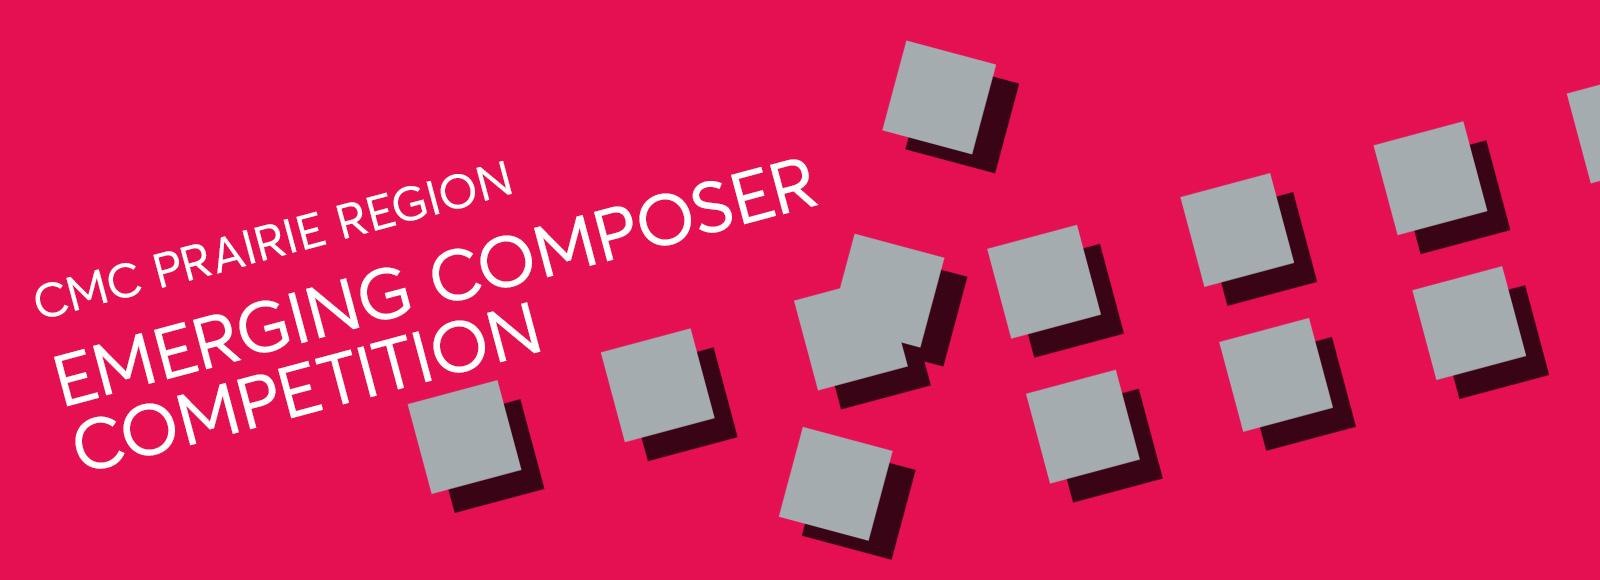 Emerging Composer Competition – CMC Prairie Region